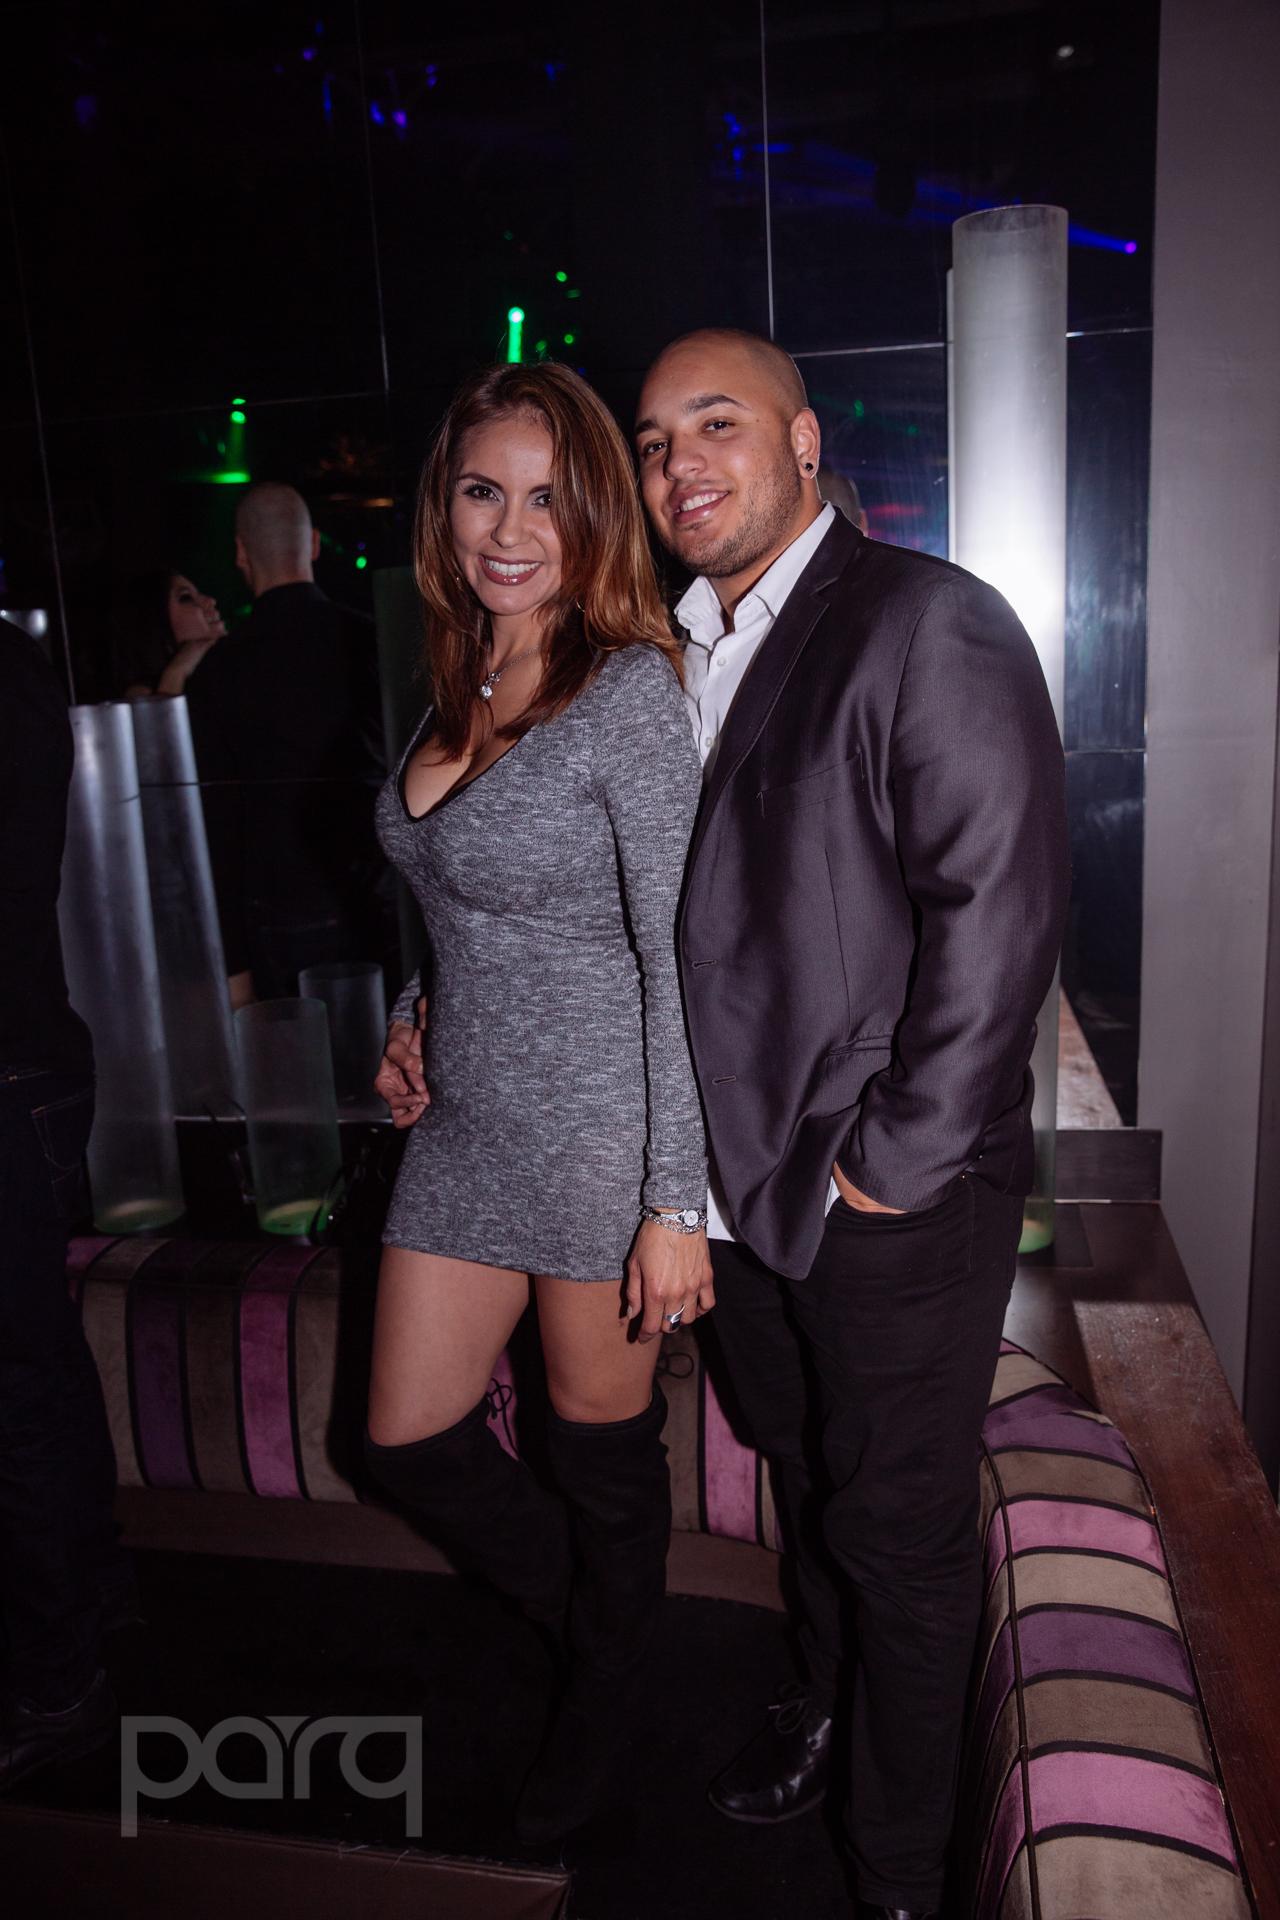 San-Diego-Nightclub-Zoo Funktion-25.jpg